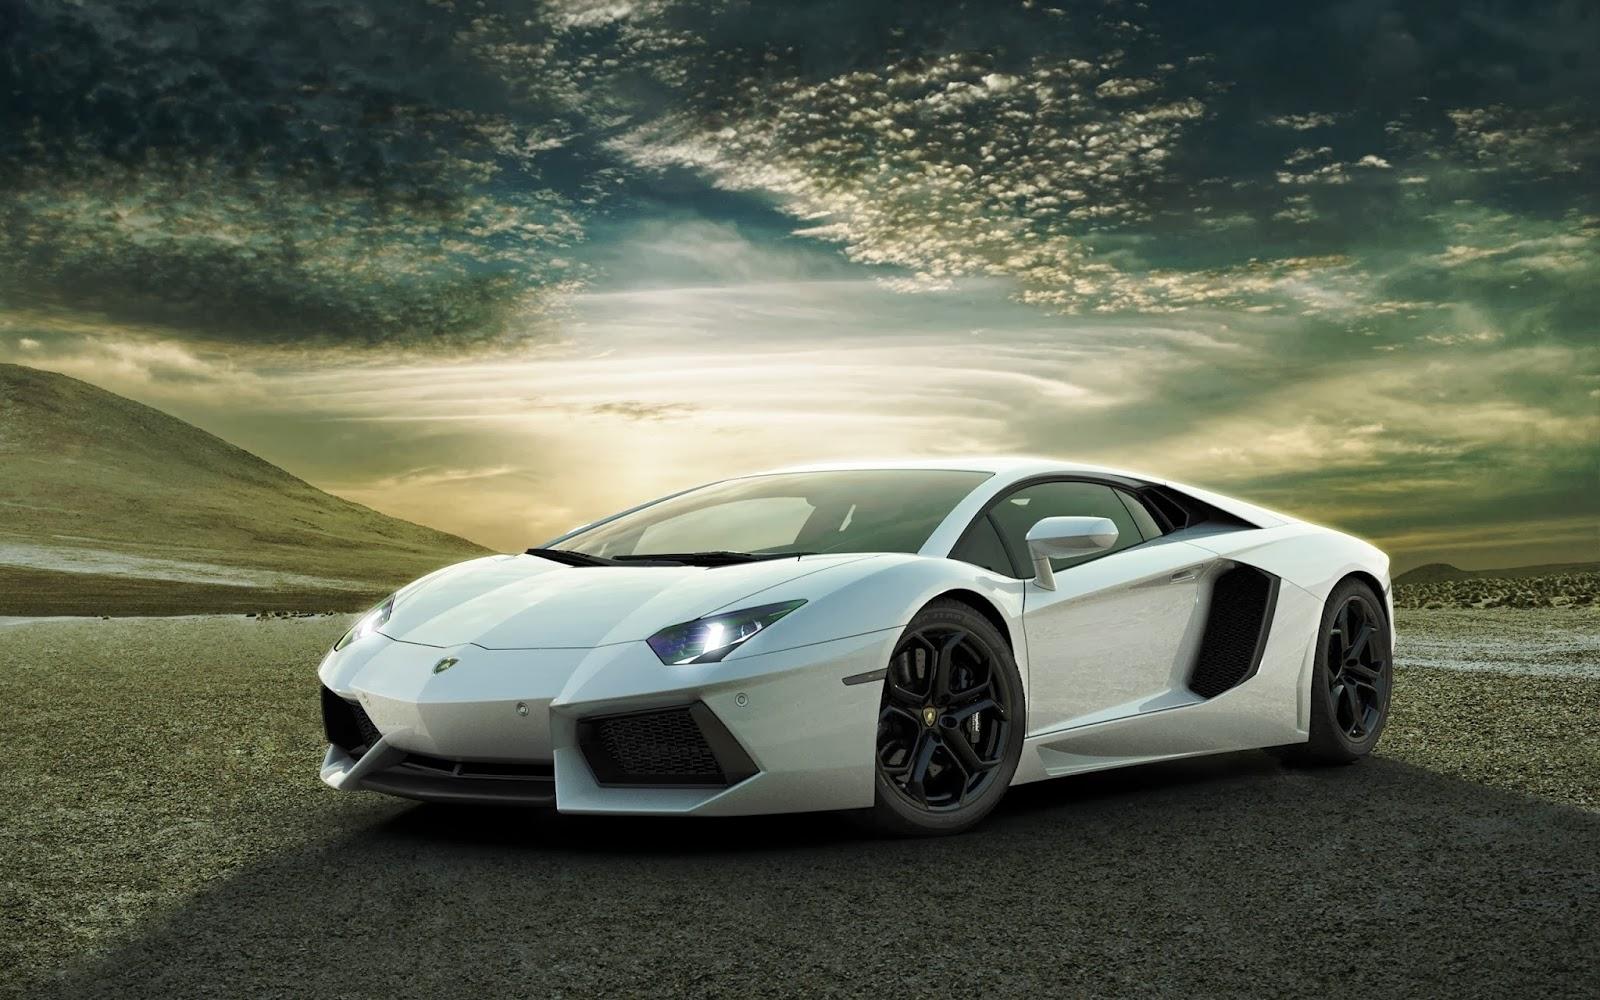 "<img src=""http://2.bp.blogspot.com/-fo7E7hbG_4I/Uu1Vt48E4OI/AAAAAAAAK1g/P5J_GiPAbL0/s1600/lamborghini-aventador-wallpaper.jpg"" alt=""Lamborghini wallpaper"" />"